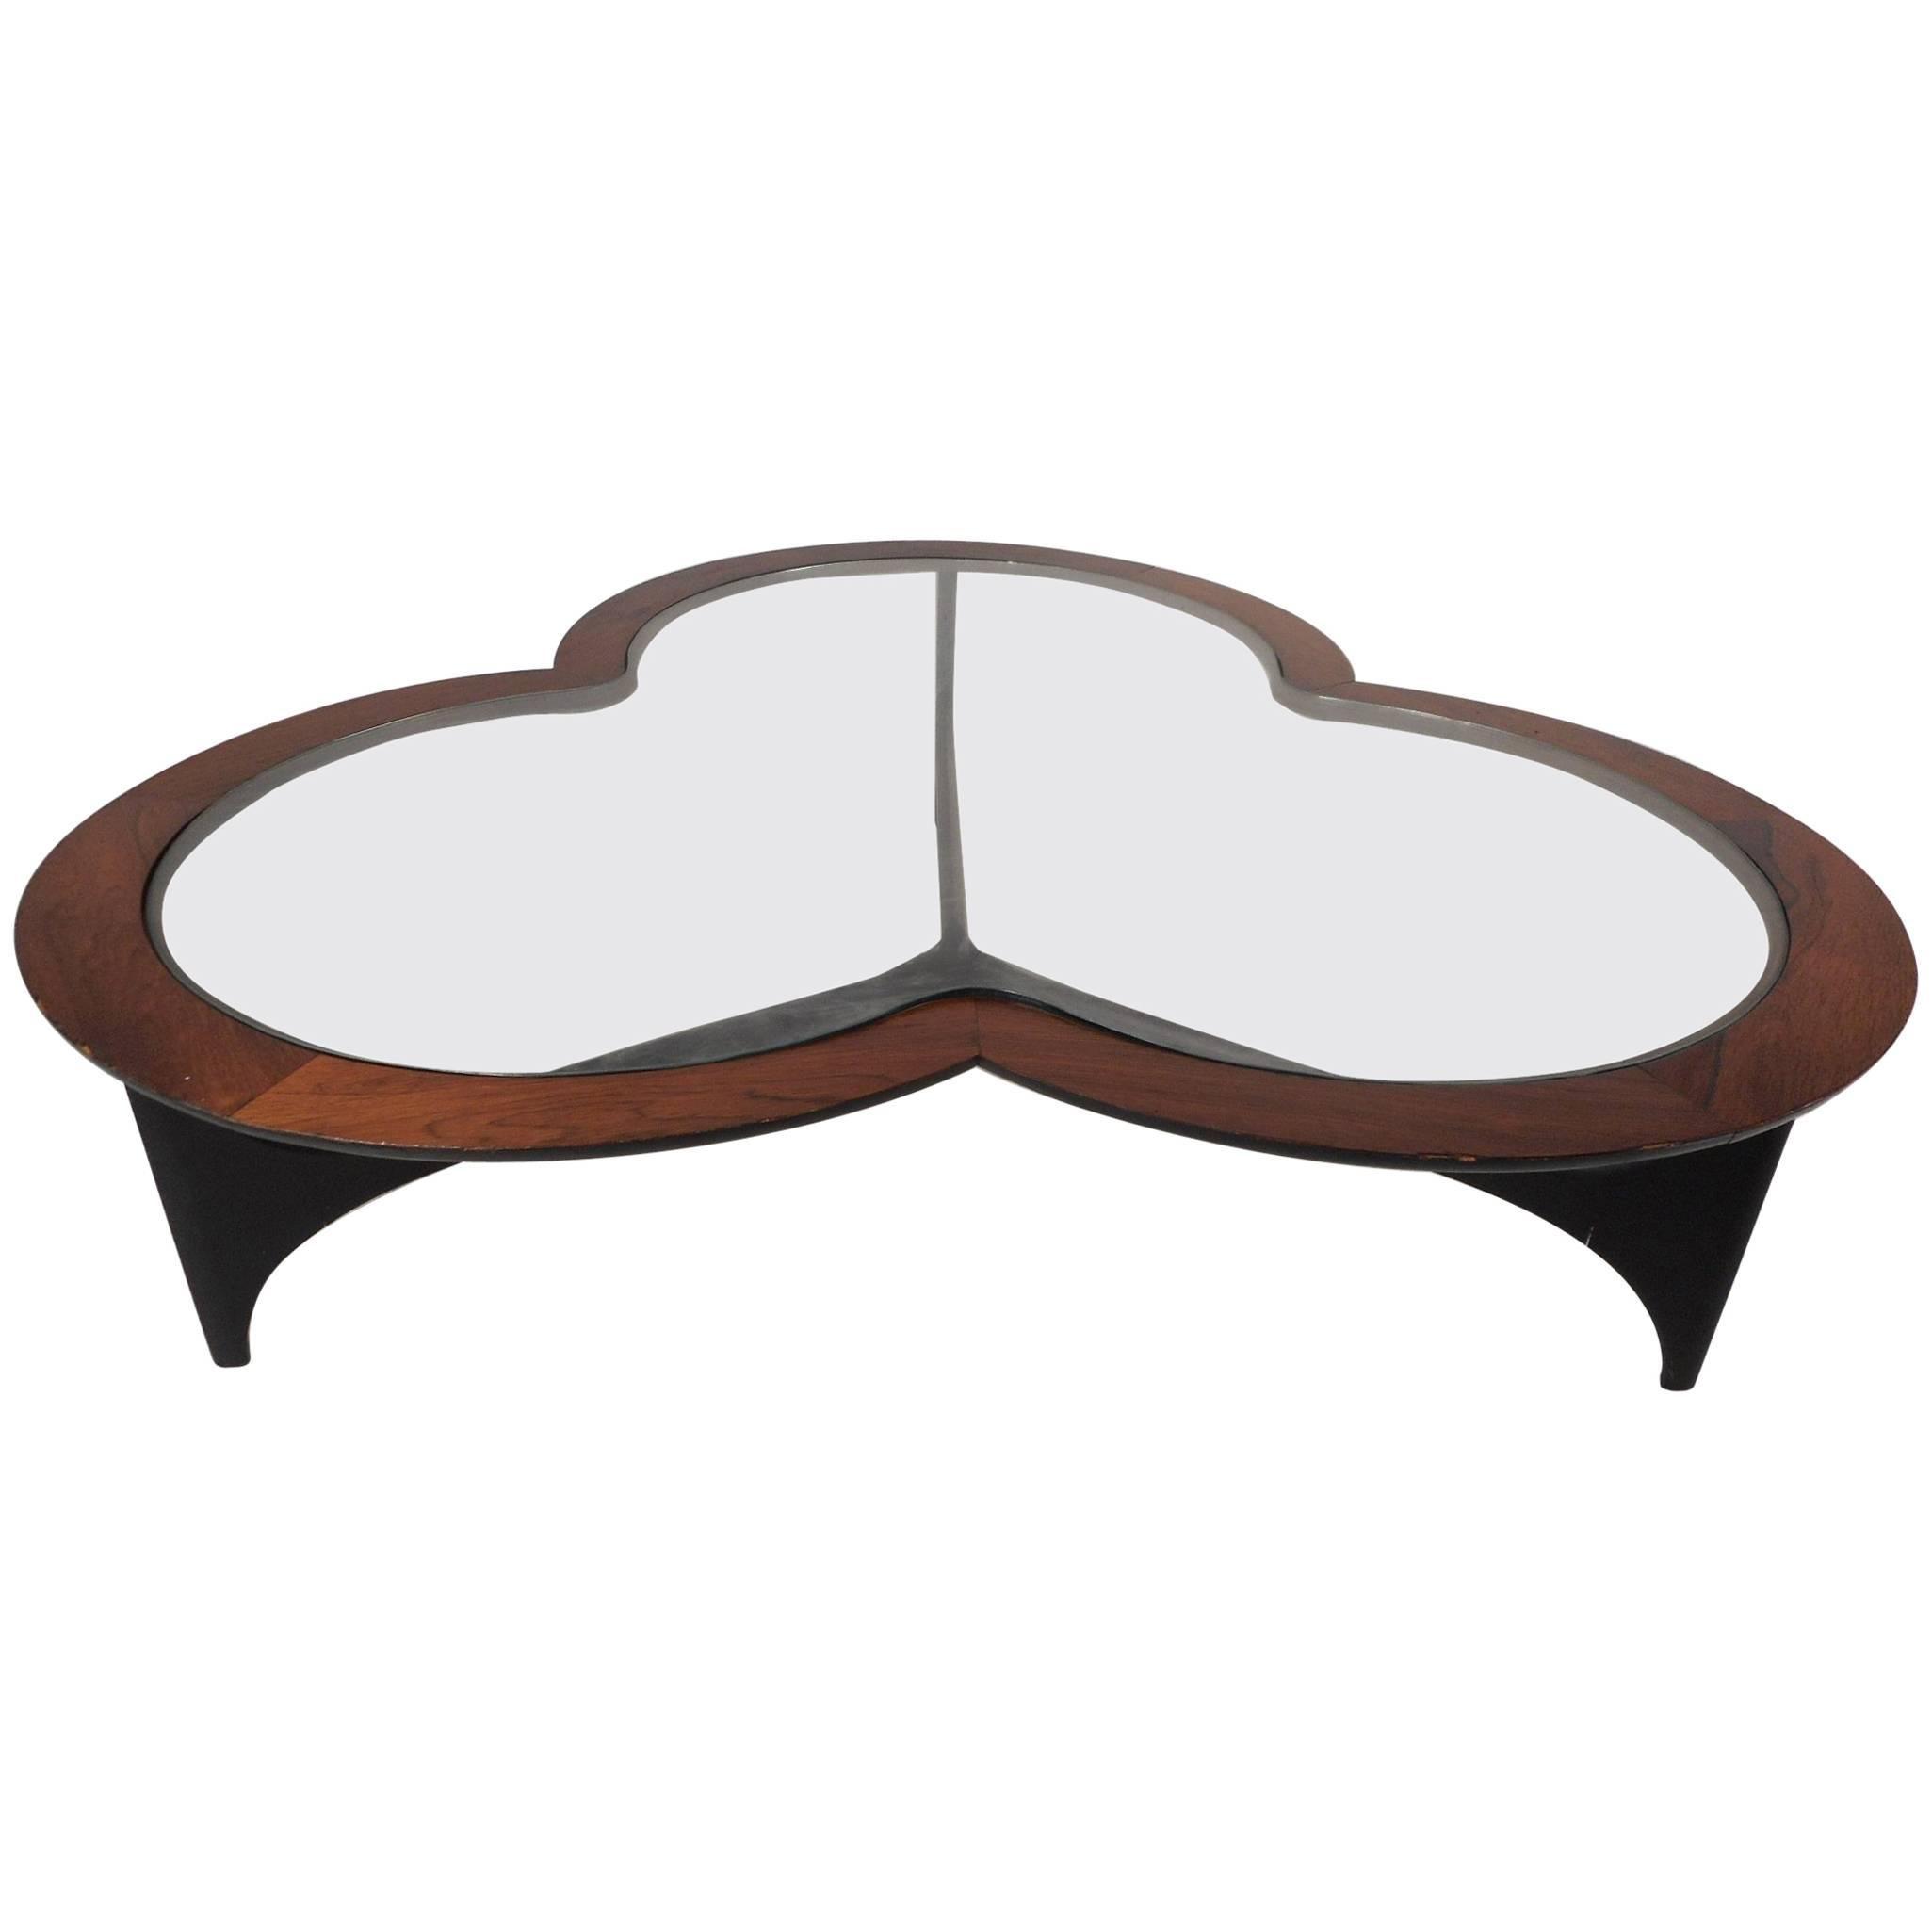 Mid-Century Modern Three-Leaf Clover Walnut Coffee Table by Lane Furniture